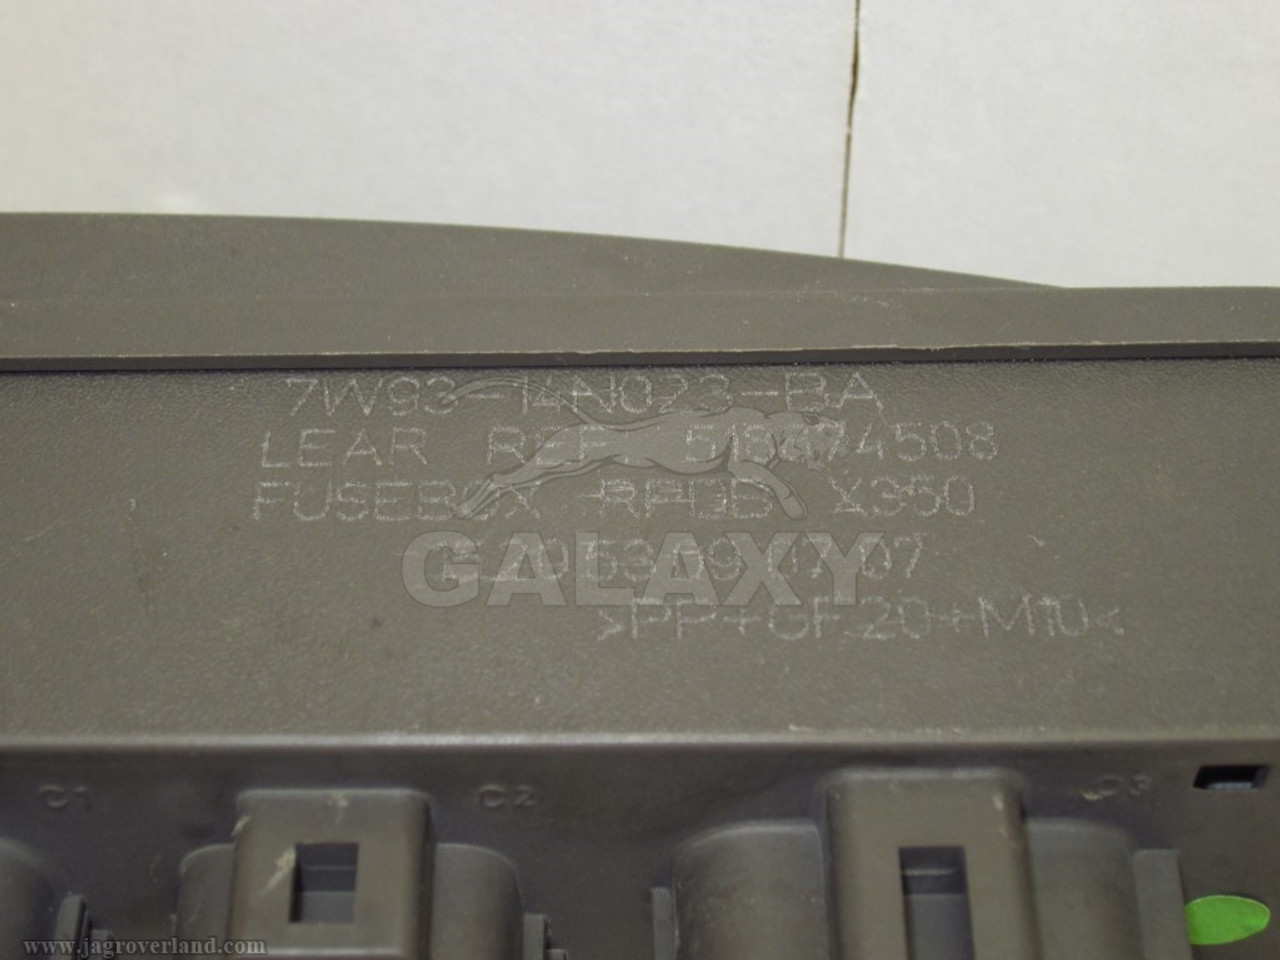 medium resolution of 08 09 xj8 xjr rear trunk mounted fuse and relay box oem c2c34455 7w93